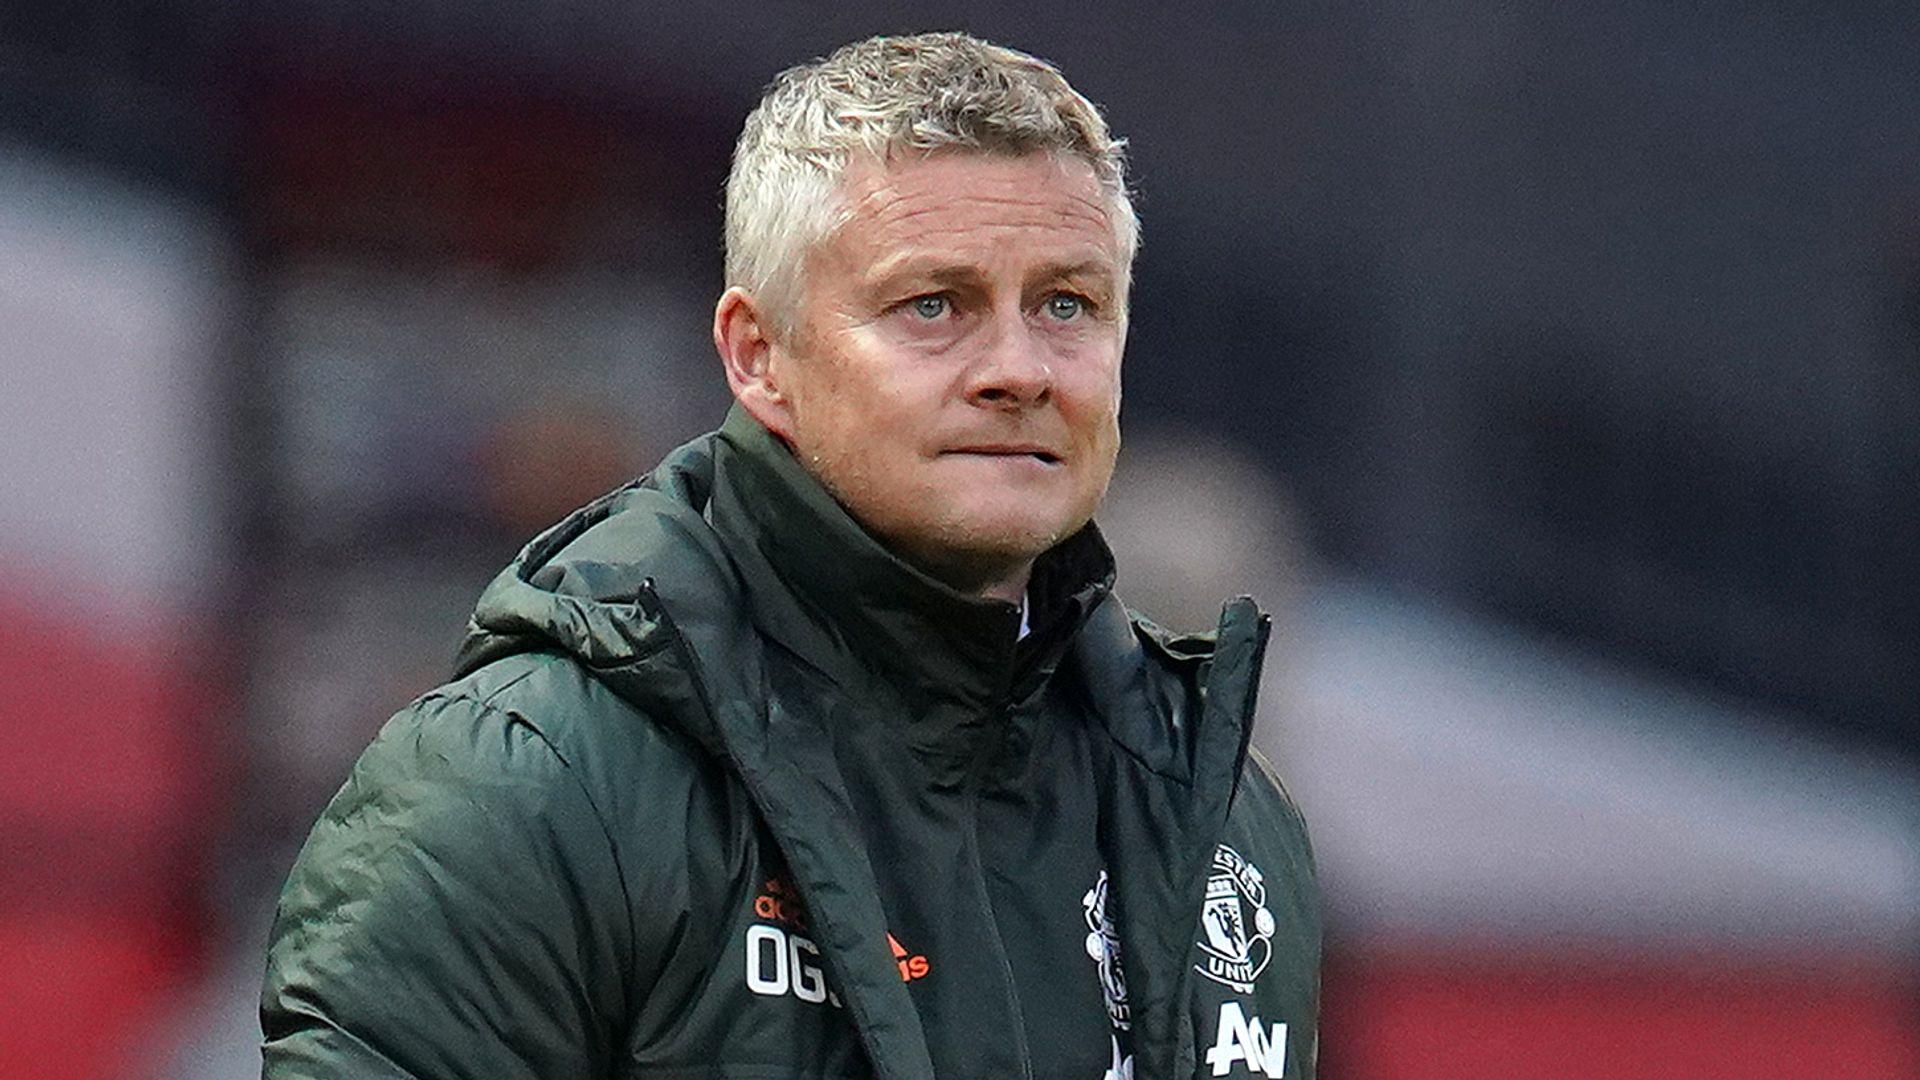 Back Man Utd to finish outside top three - Jones Knows